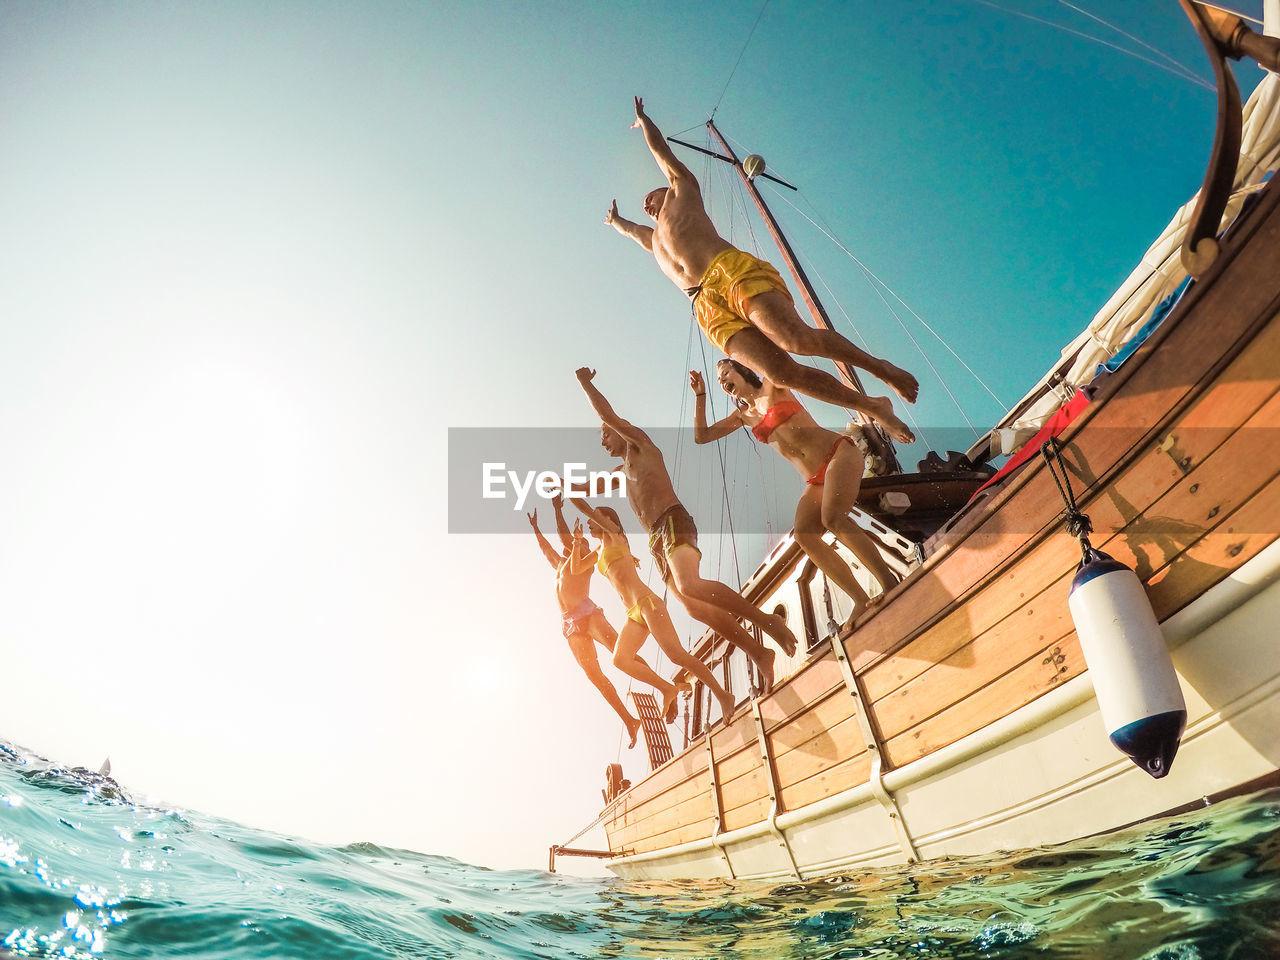 People Jumping In Sea Against Sky